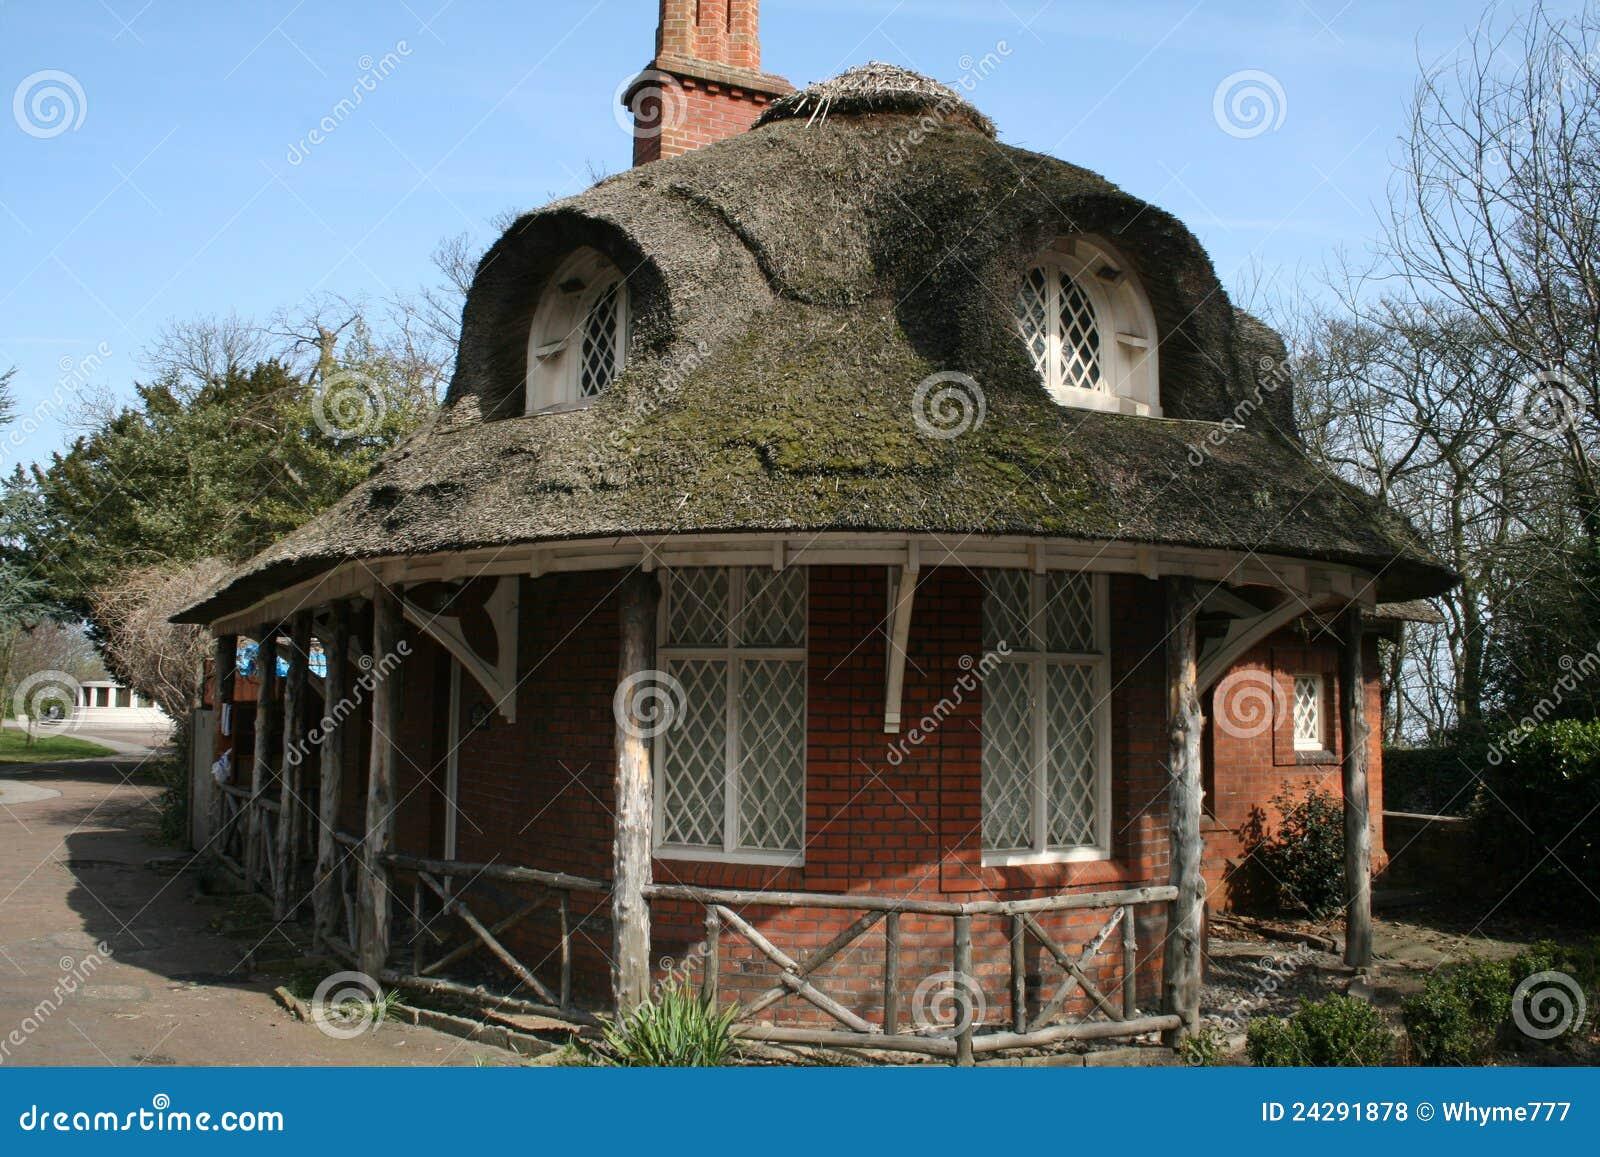 Thatch Roof Cottage Stock Photo Image Of Windows Brick